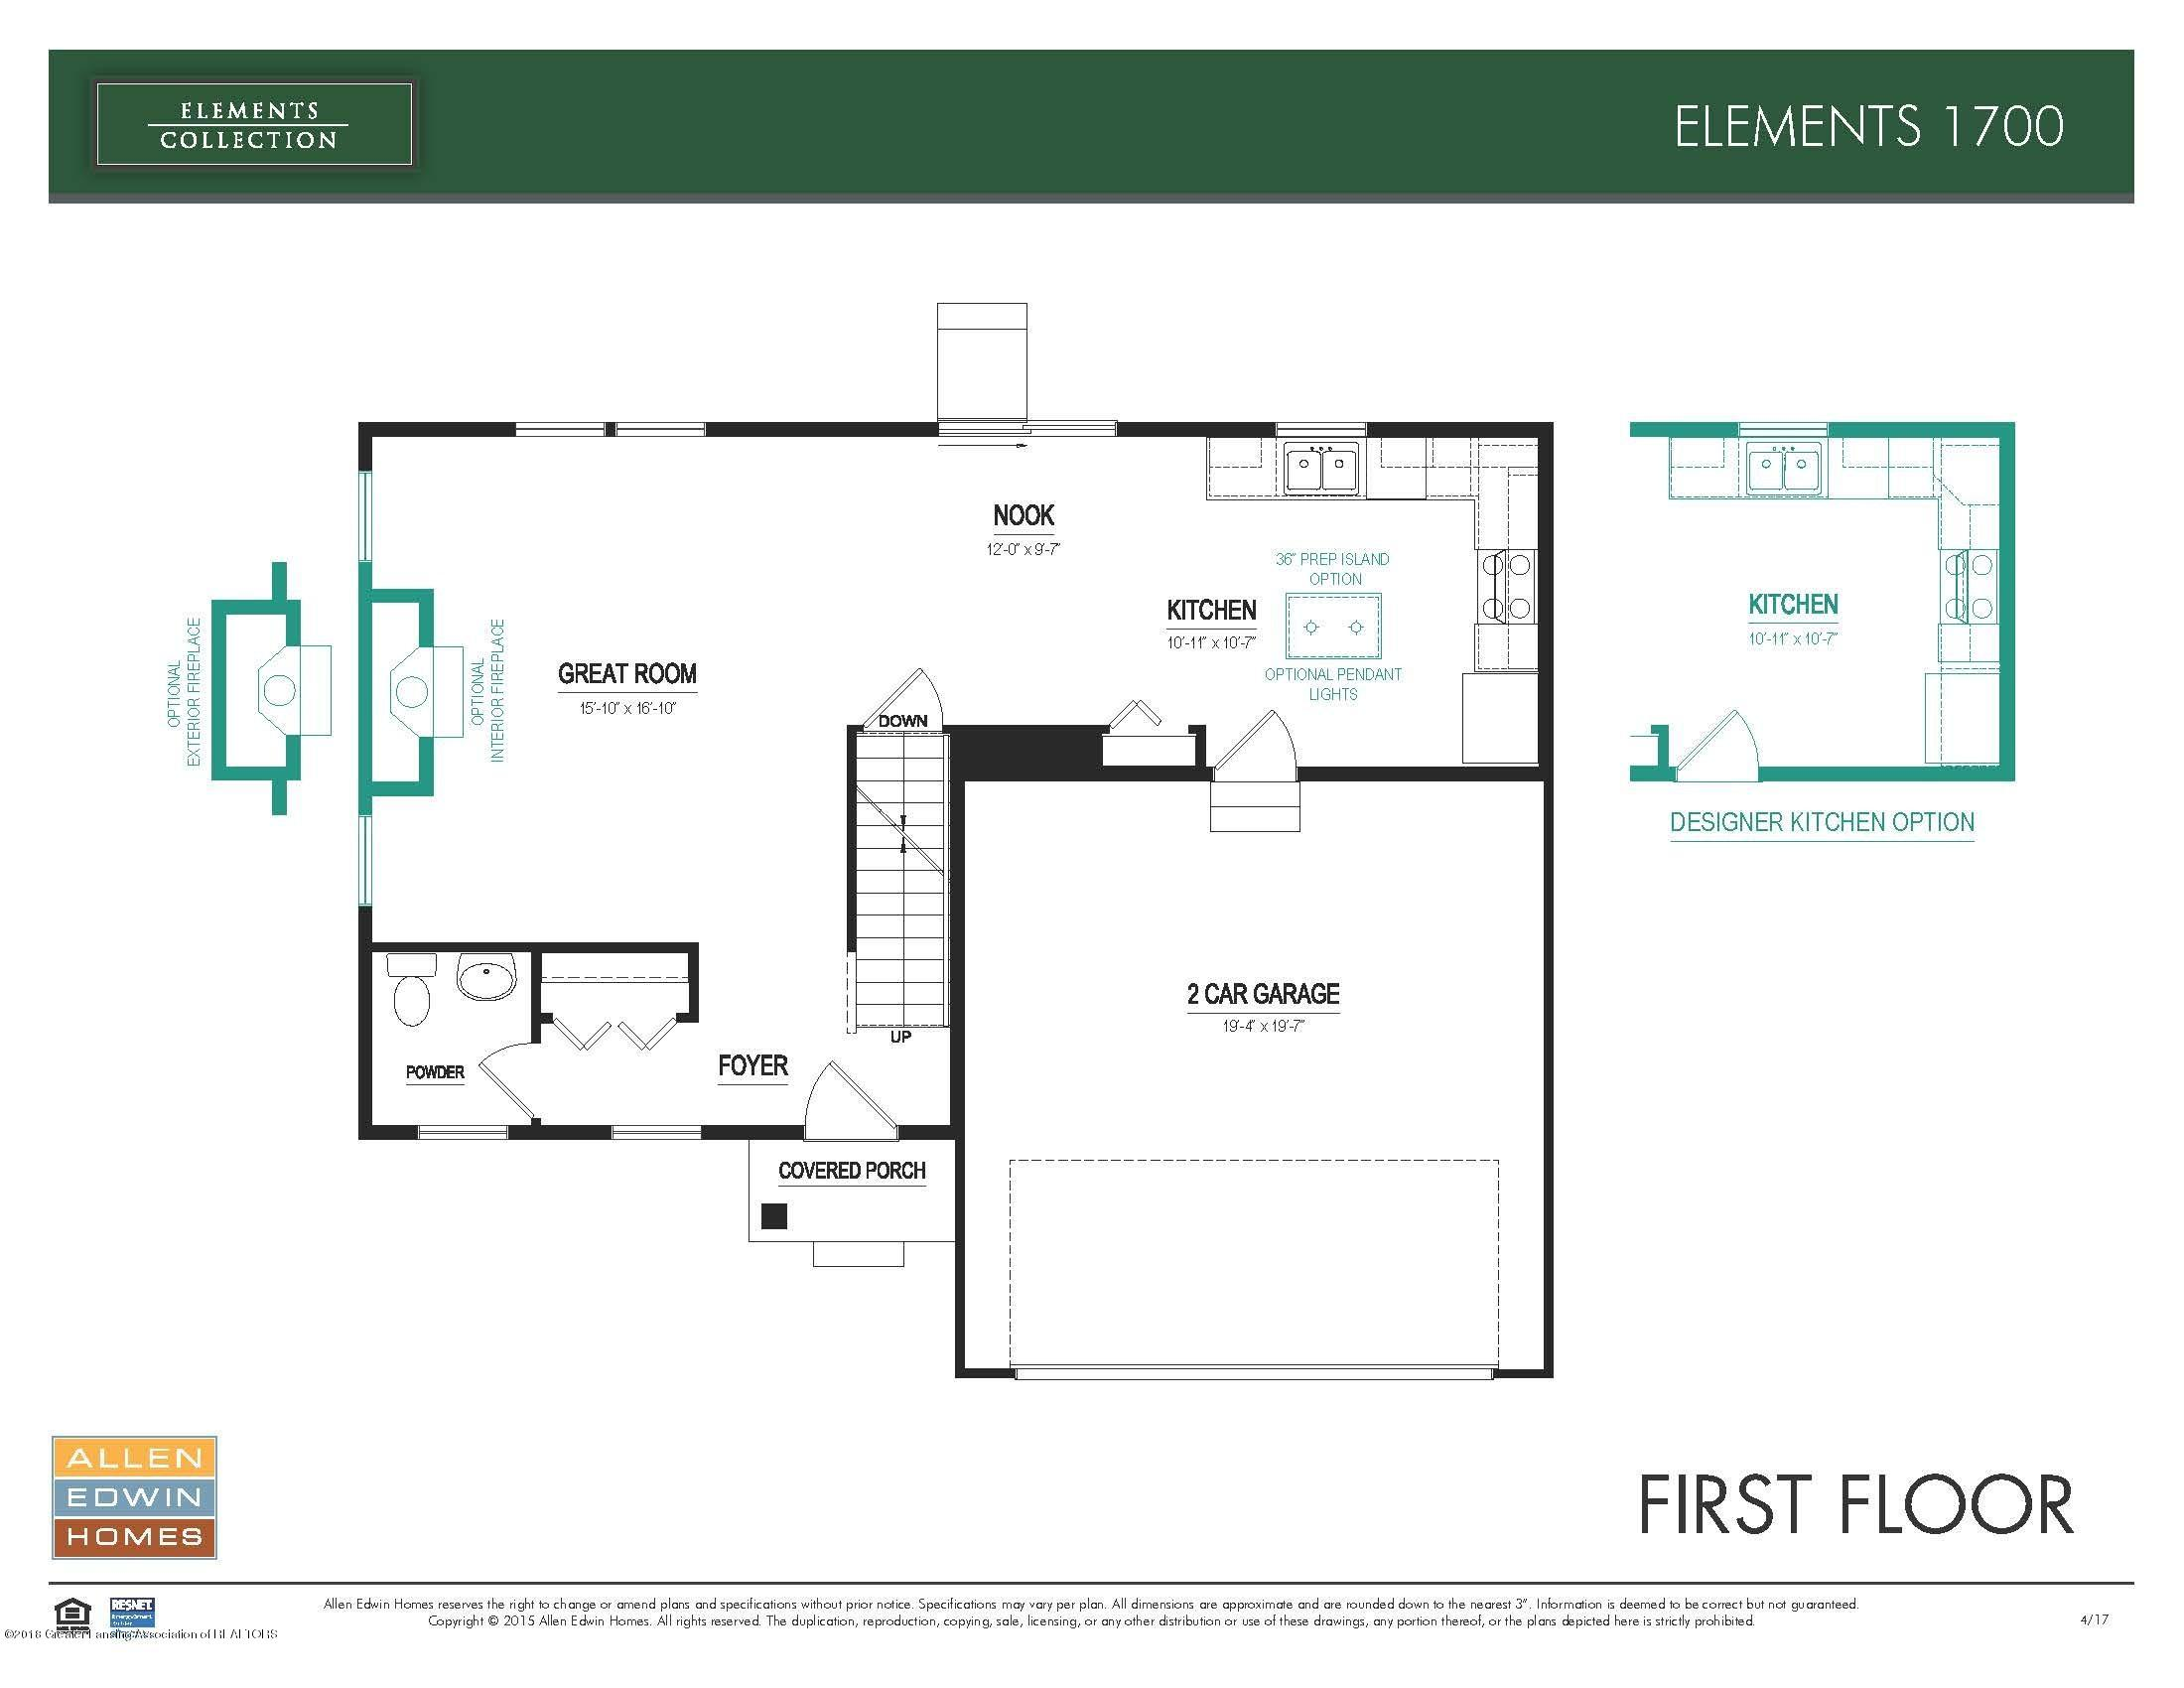 3536 Fernwood Ln - Elements 1700 First Floor - 14